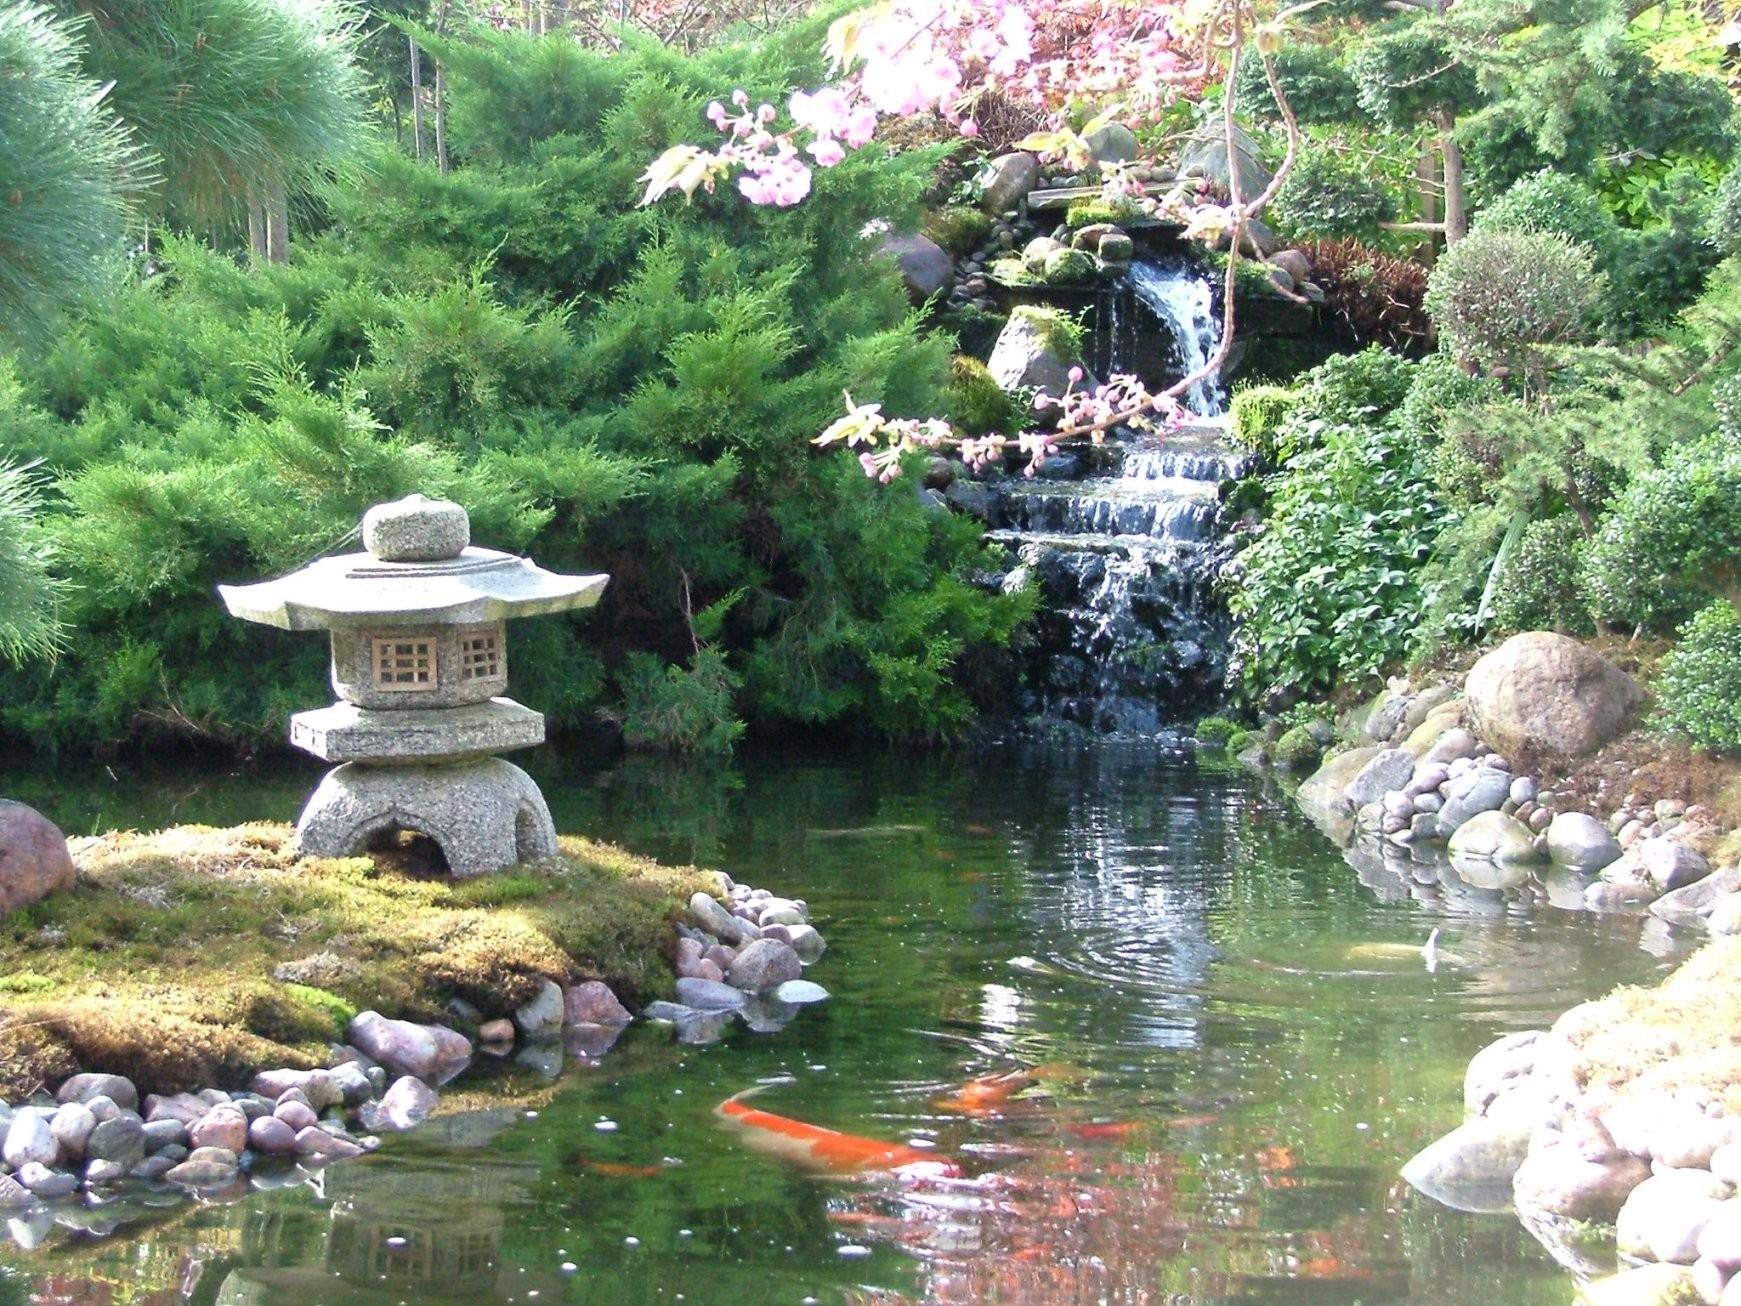 Anleitung Japanischen Garten Selbst Gestalten Wir Klären Auf von Japanischer Garten Selbst Anlegen Photo